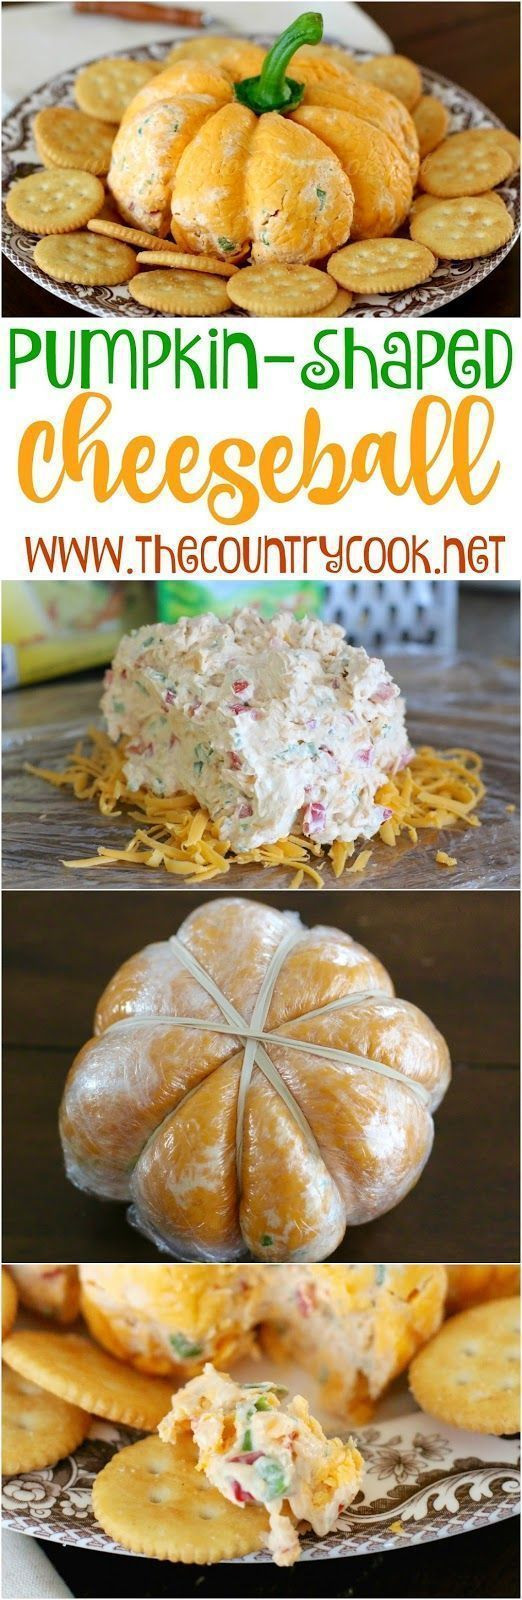 Thanksgiving Dinner Appetizers  Best 25 Turkey cheese ball ideas on Pinterest